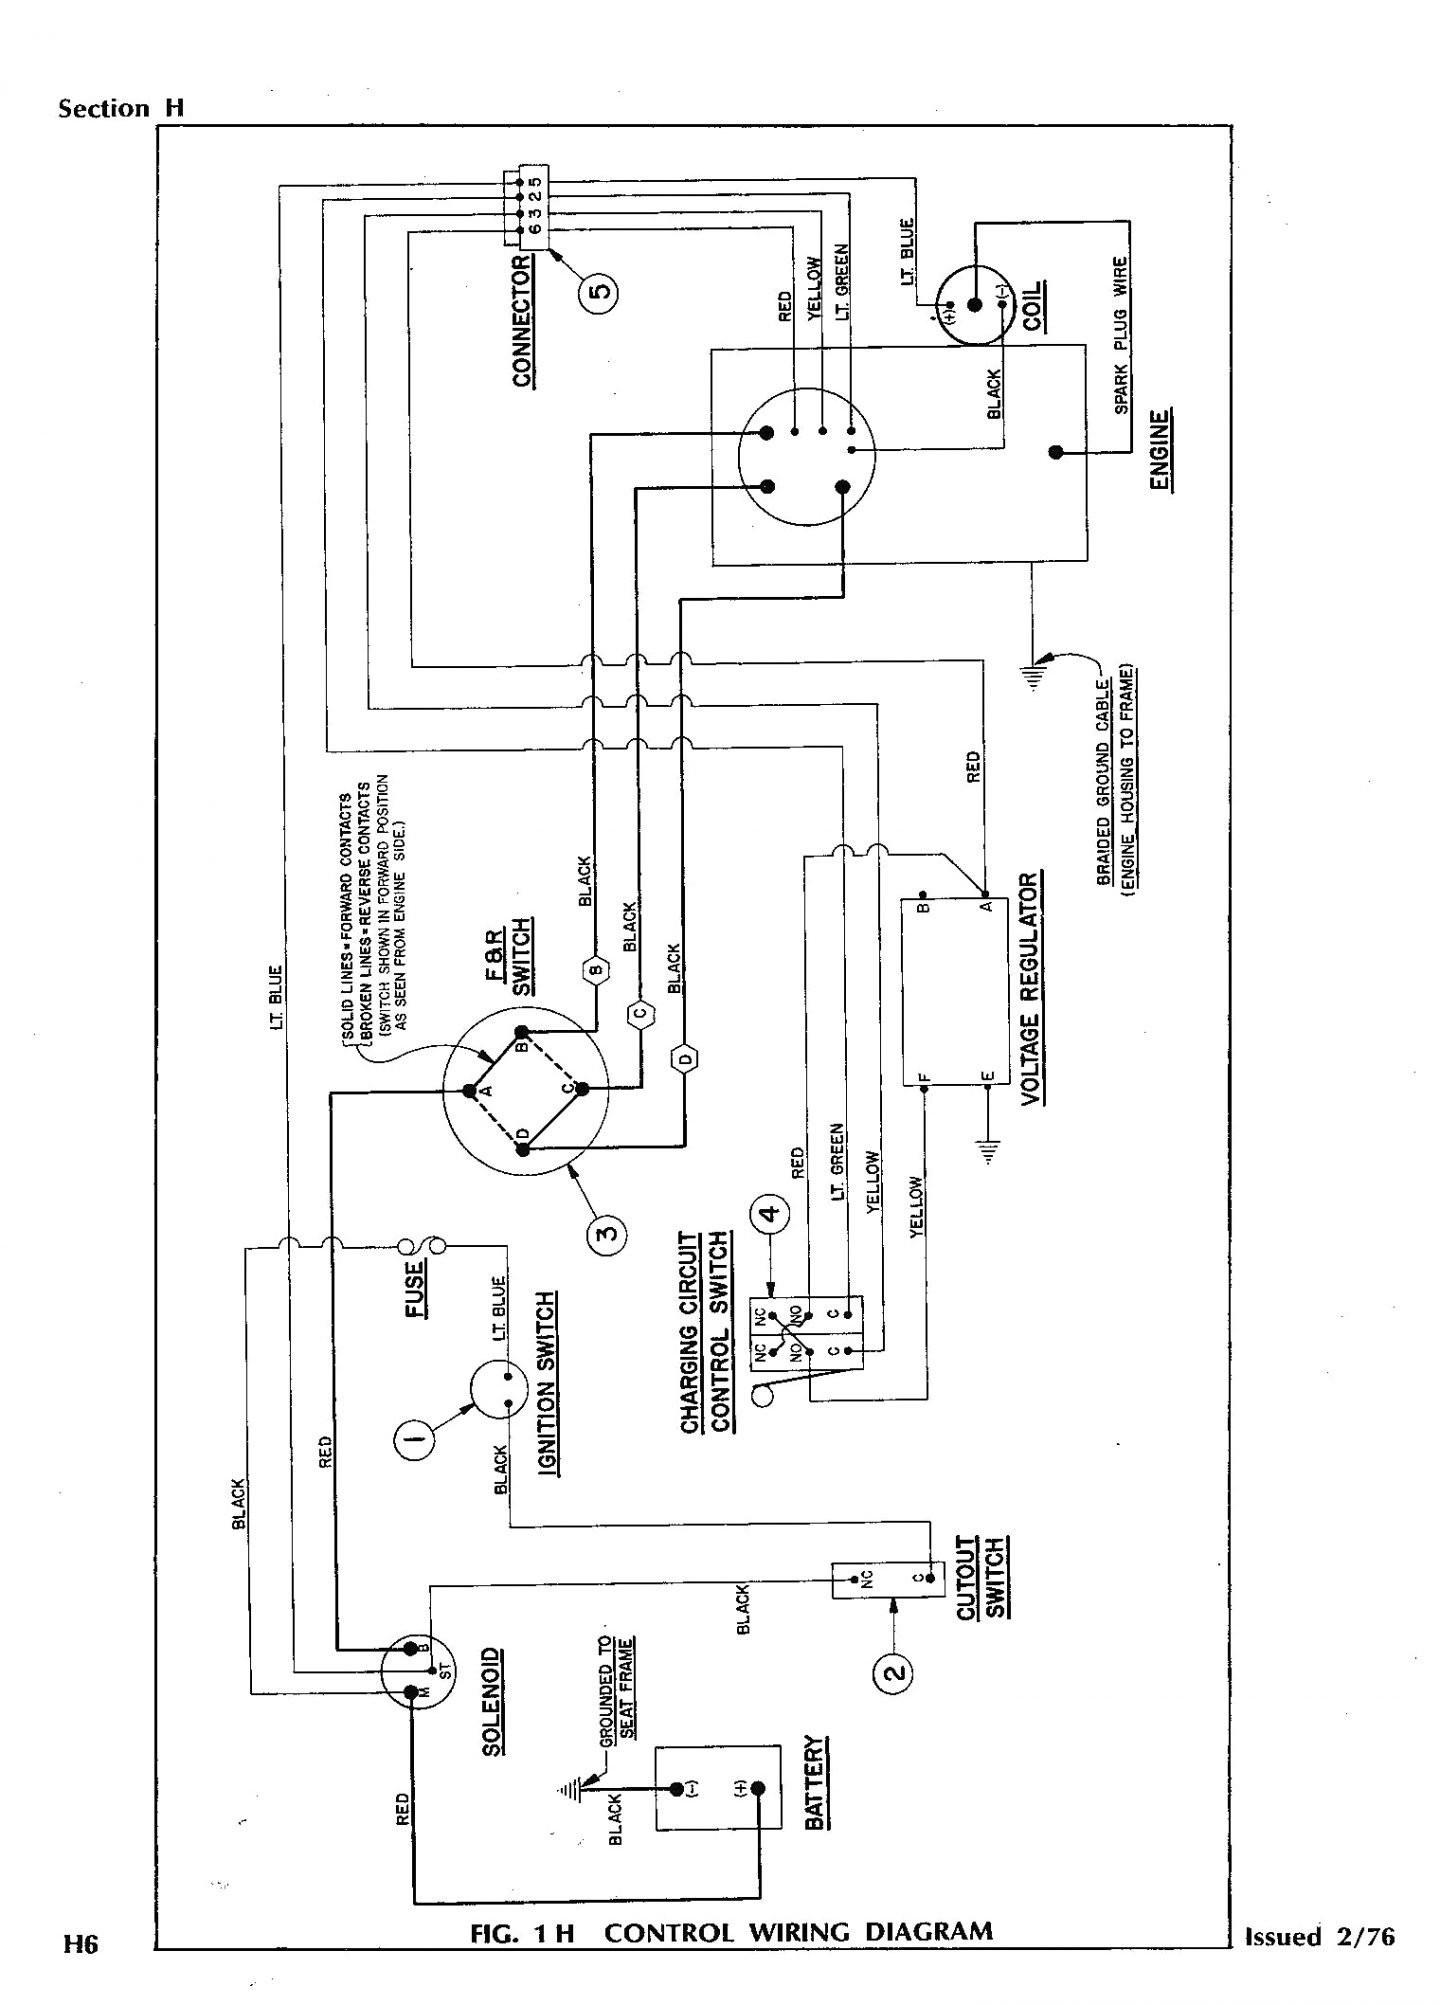 Ez Wiring Diagram | Wiring Diagram Libraries - Ez Go Gas Golf Cart Wiring Diagram